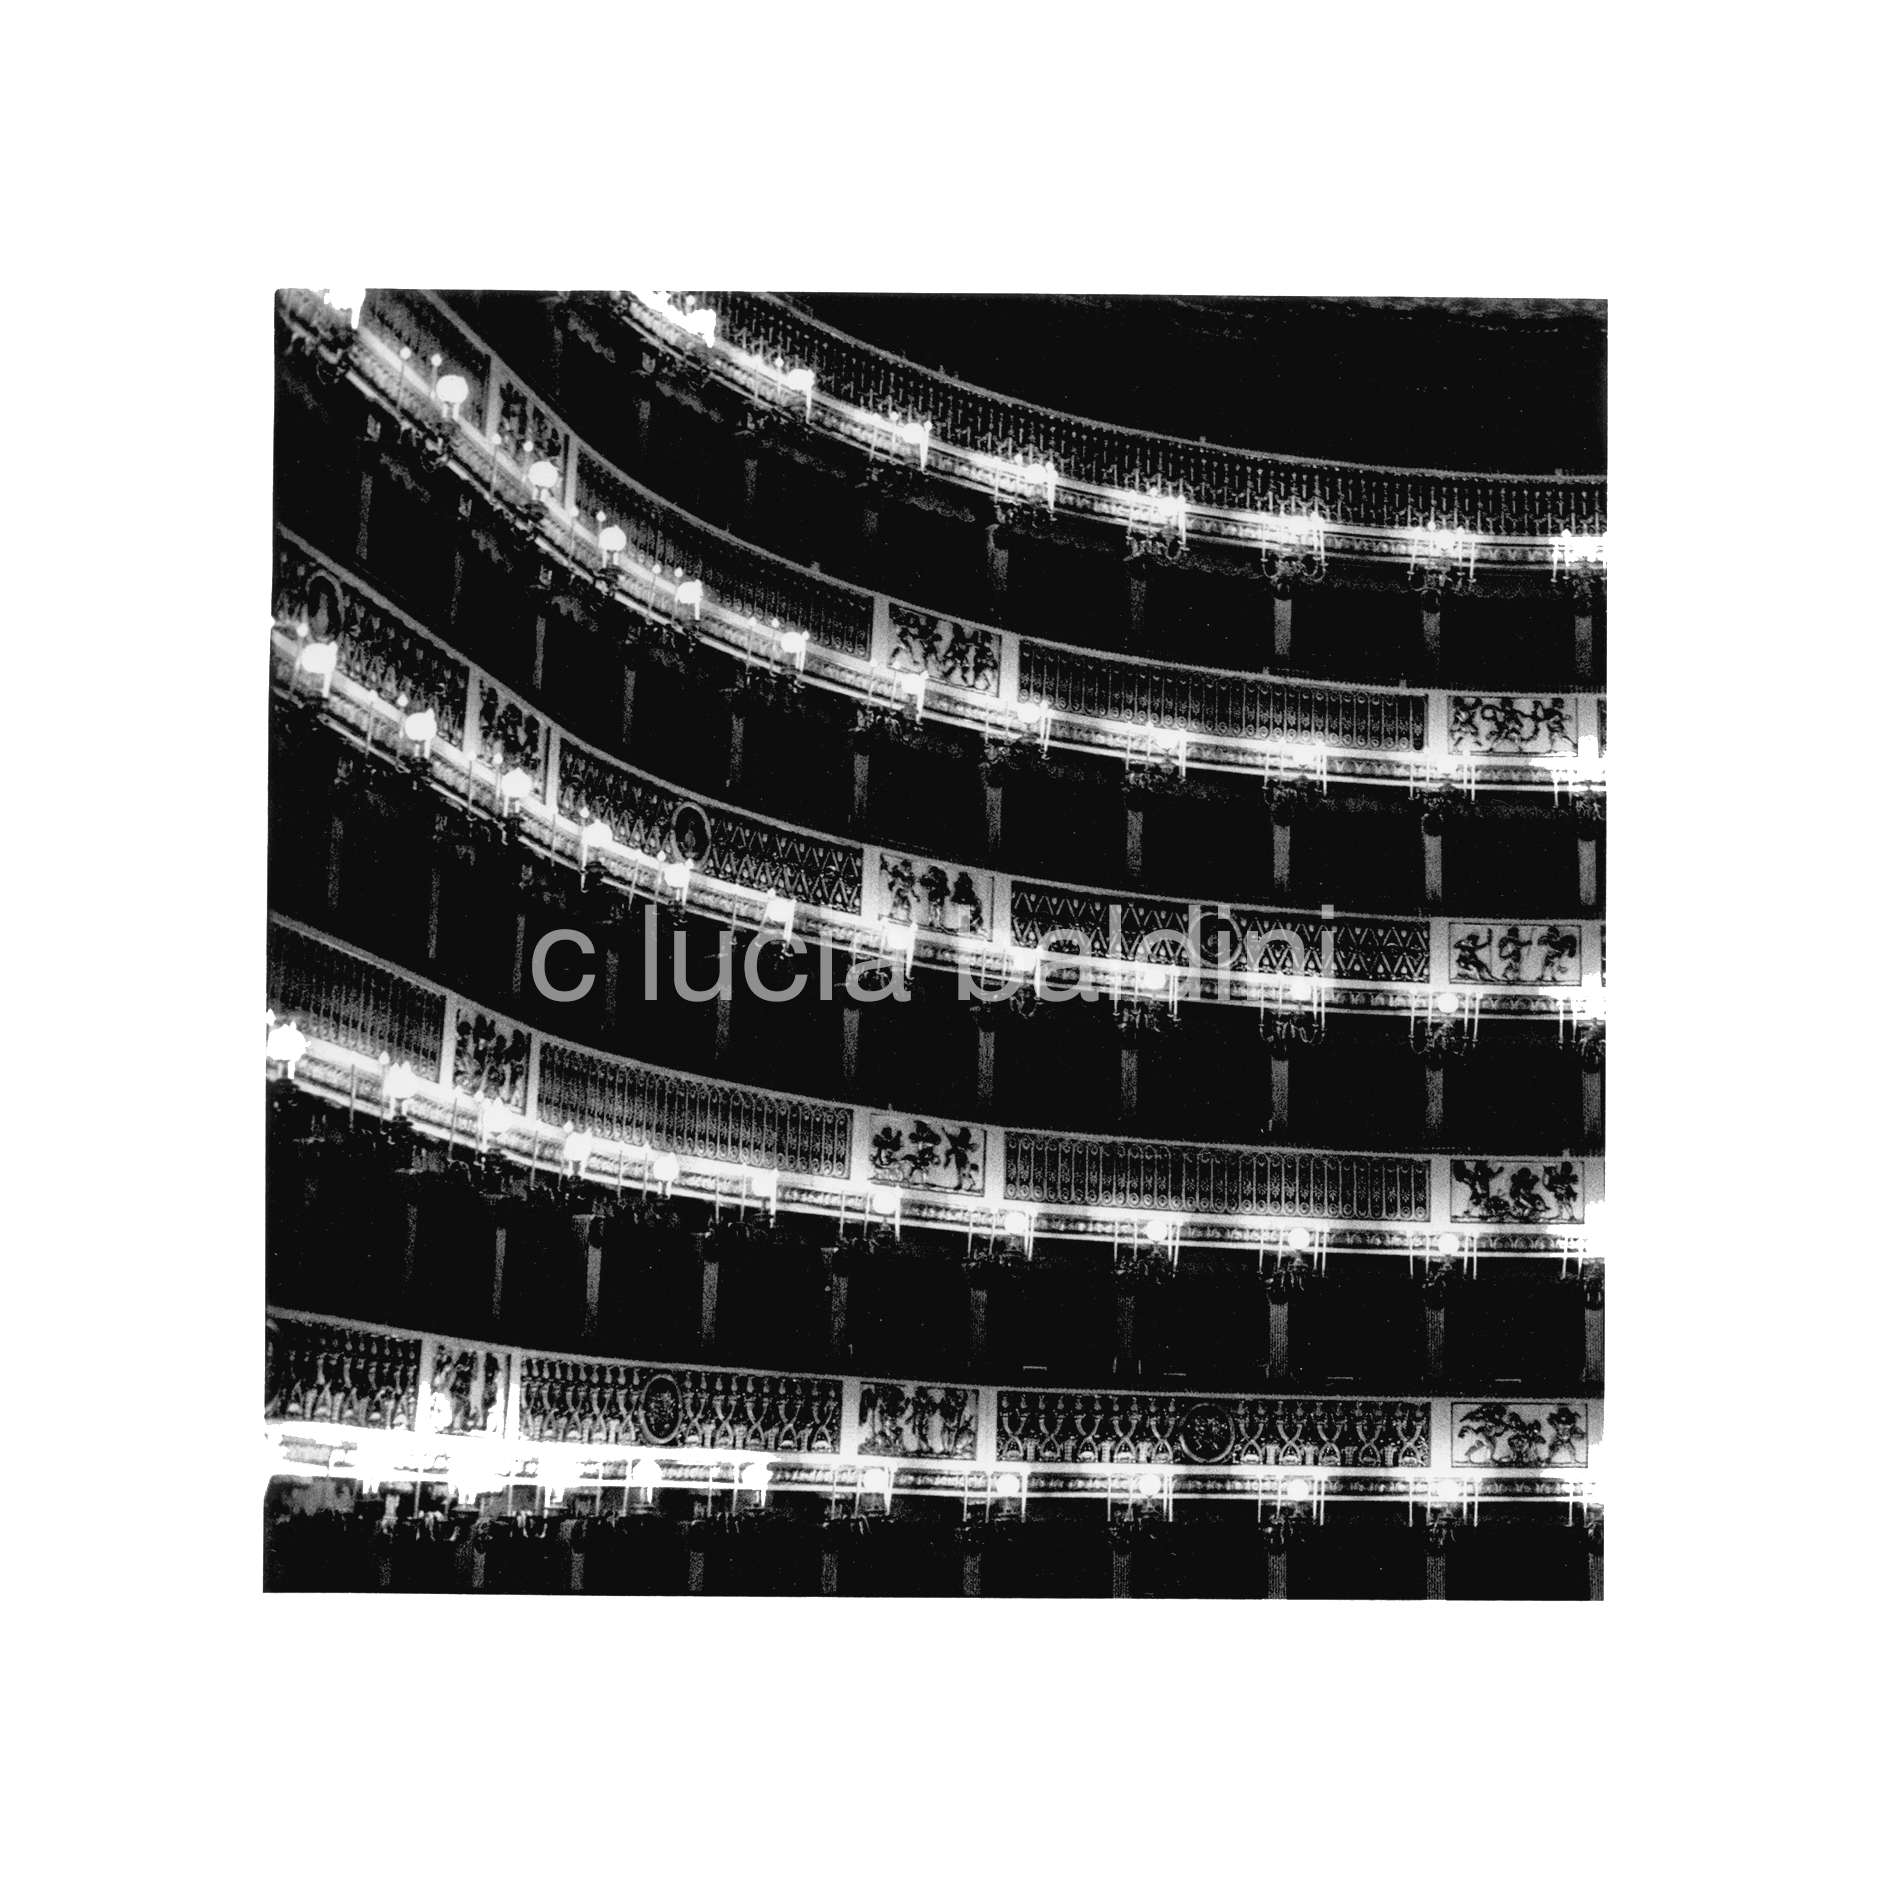 foto lucia baldini teatro filarmonico verona fil-min